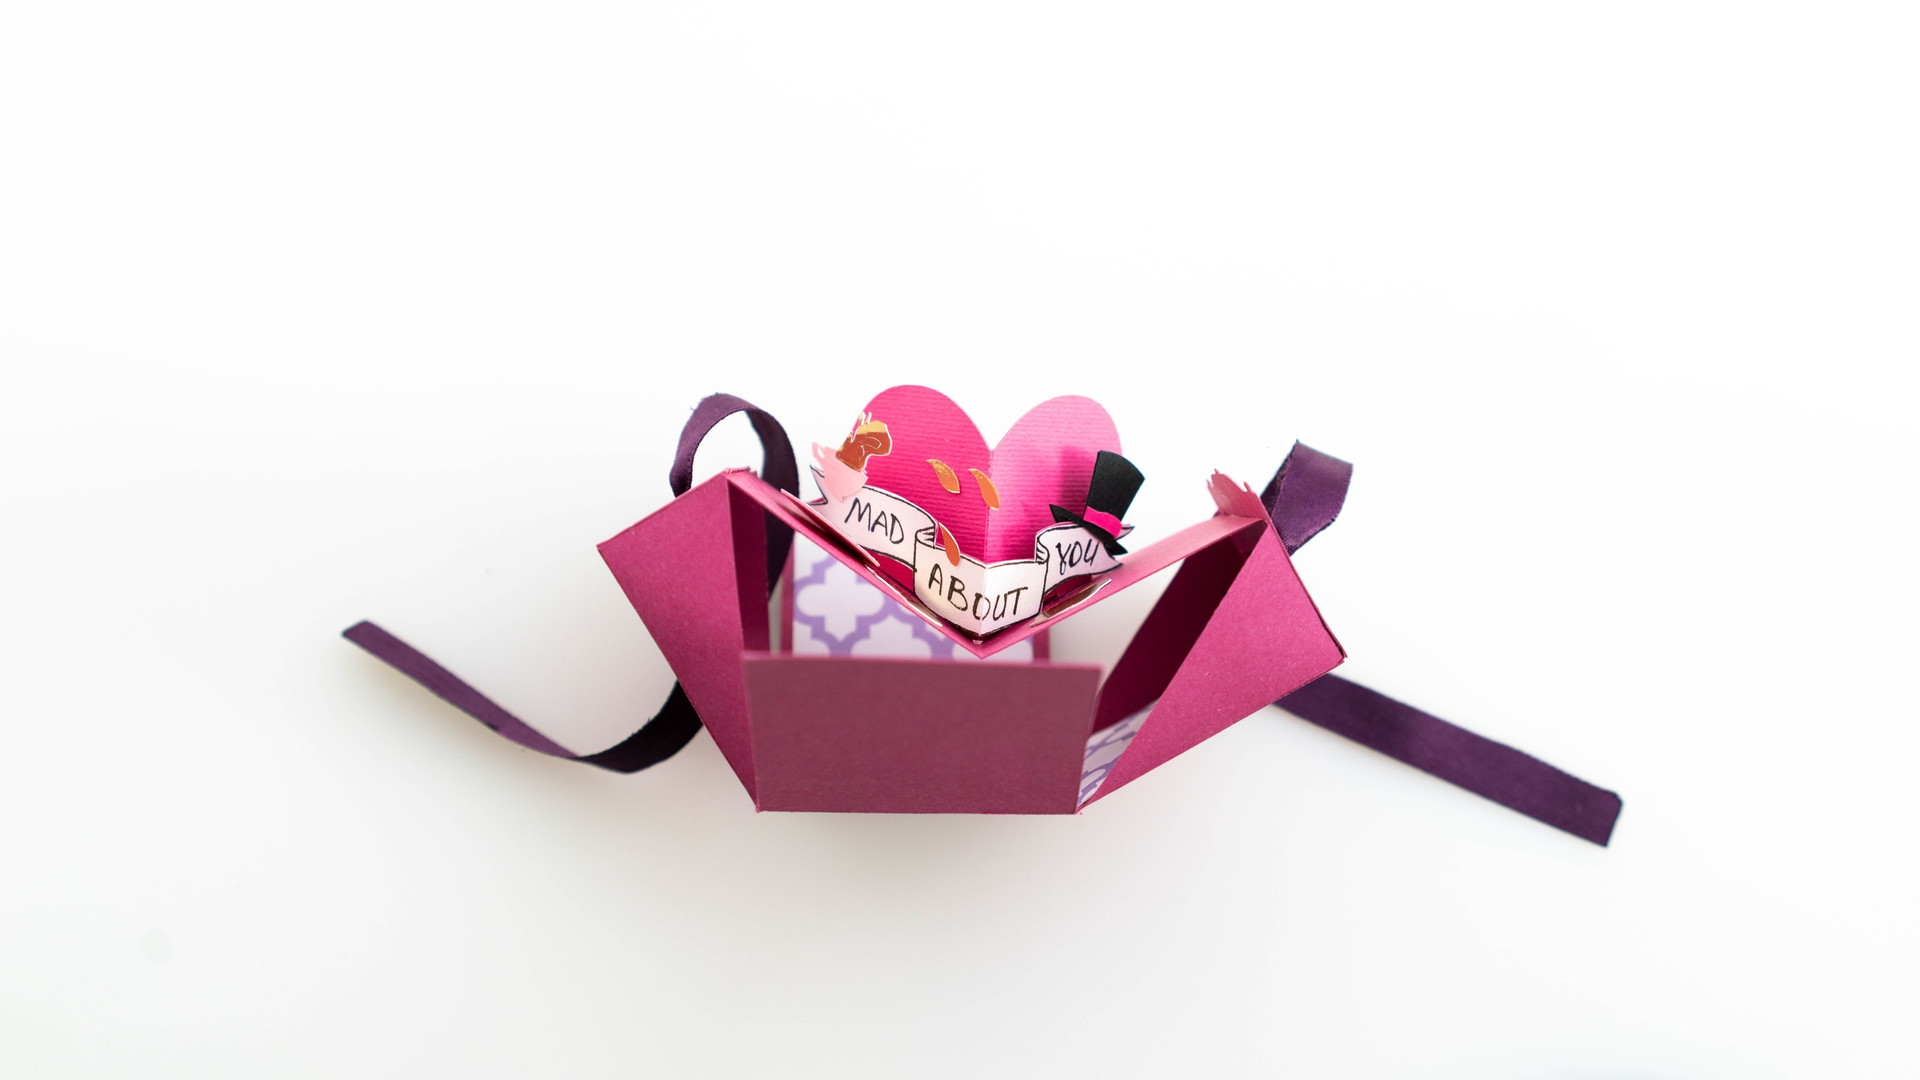 Mad Valentine's Day boxie